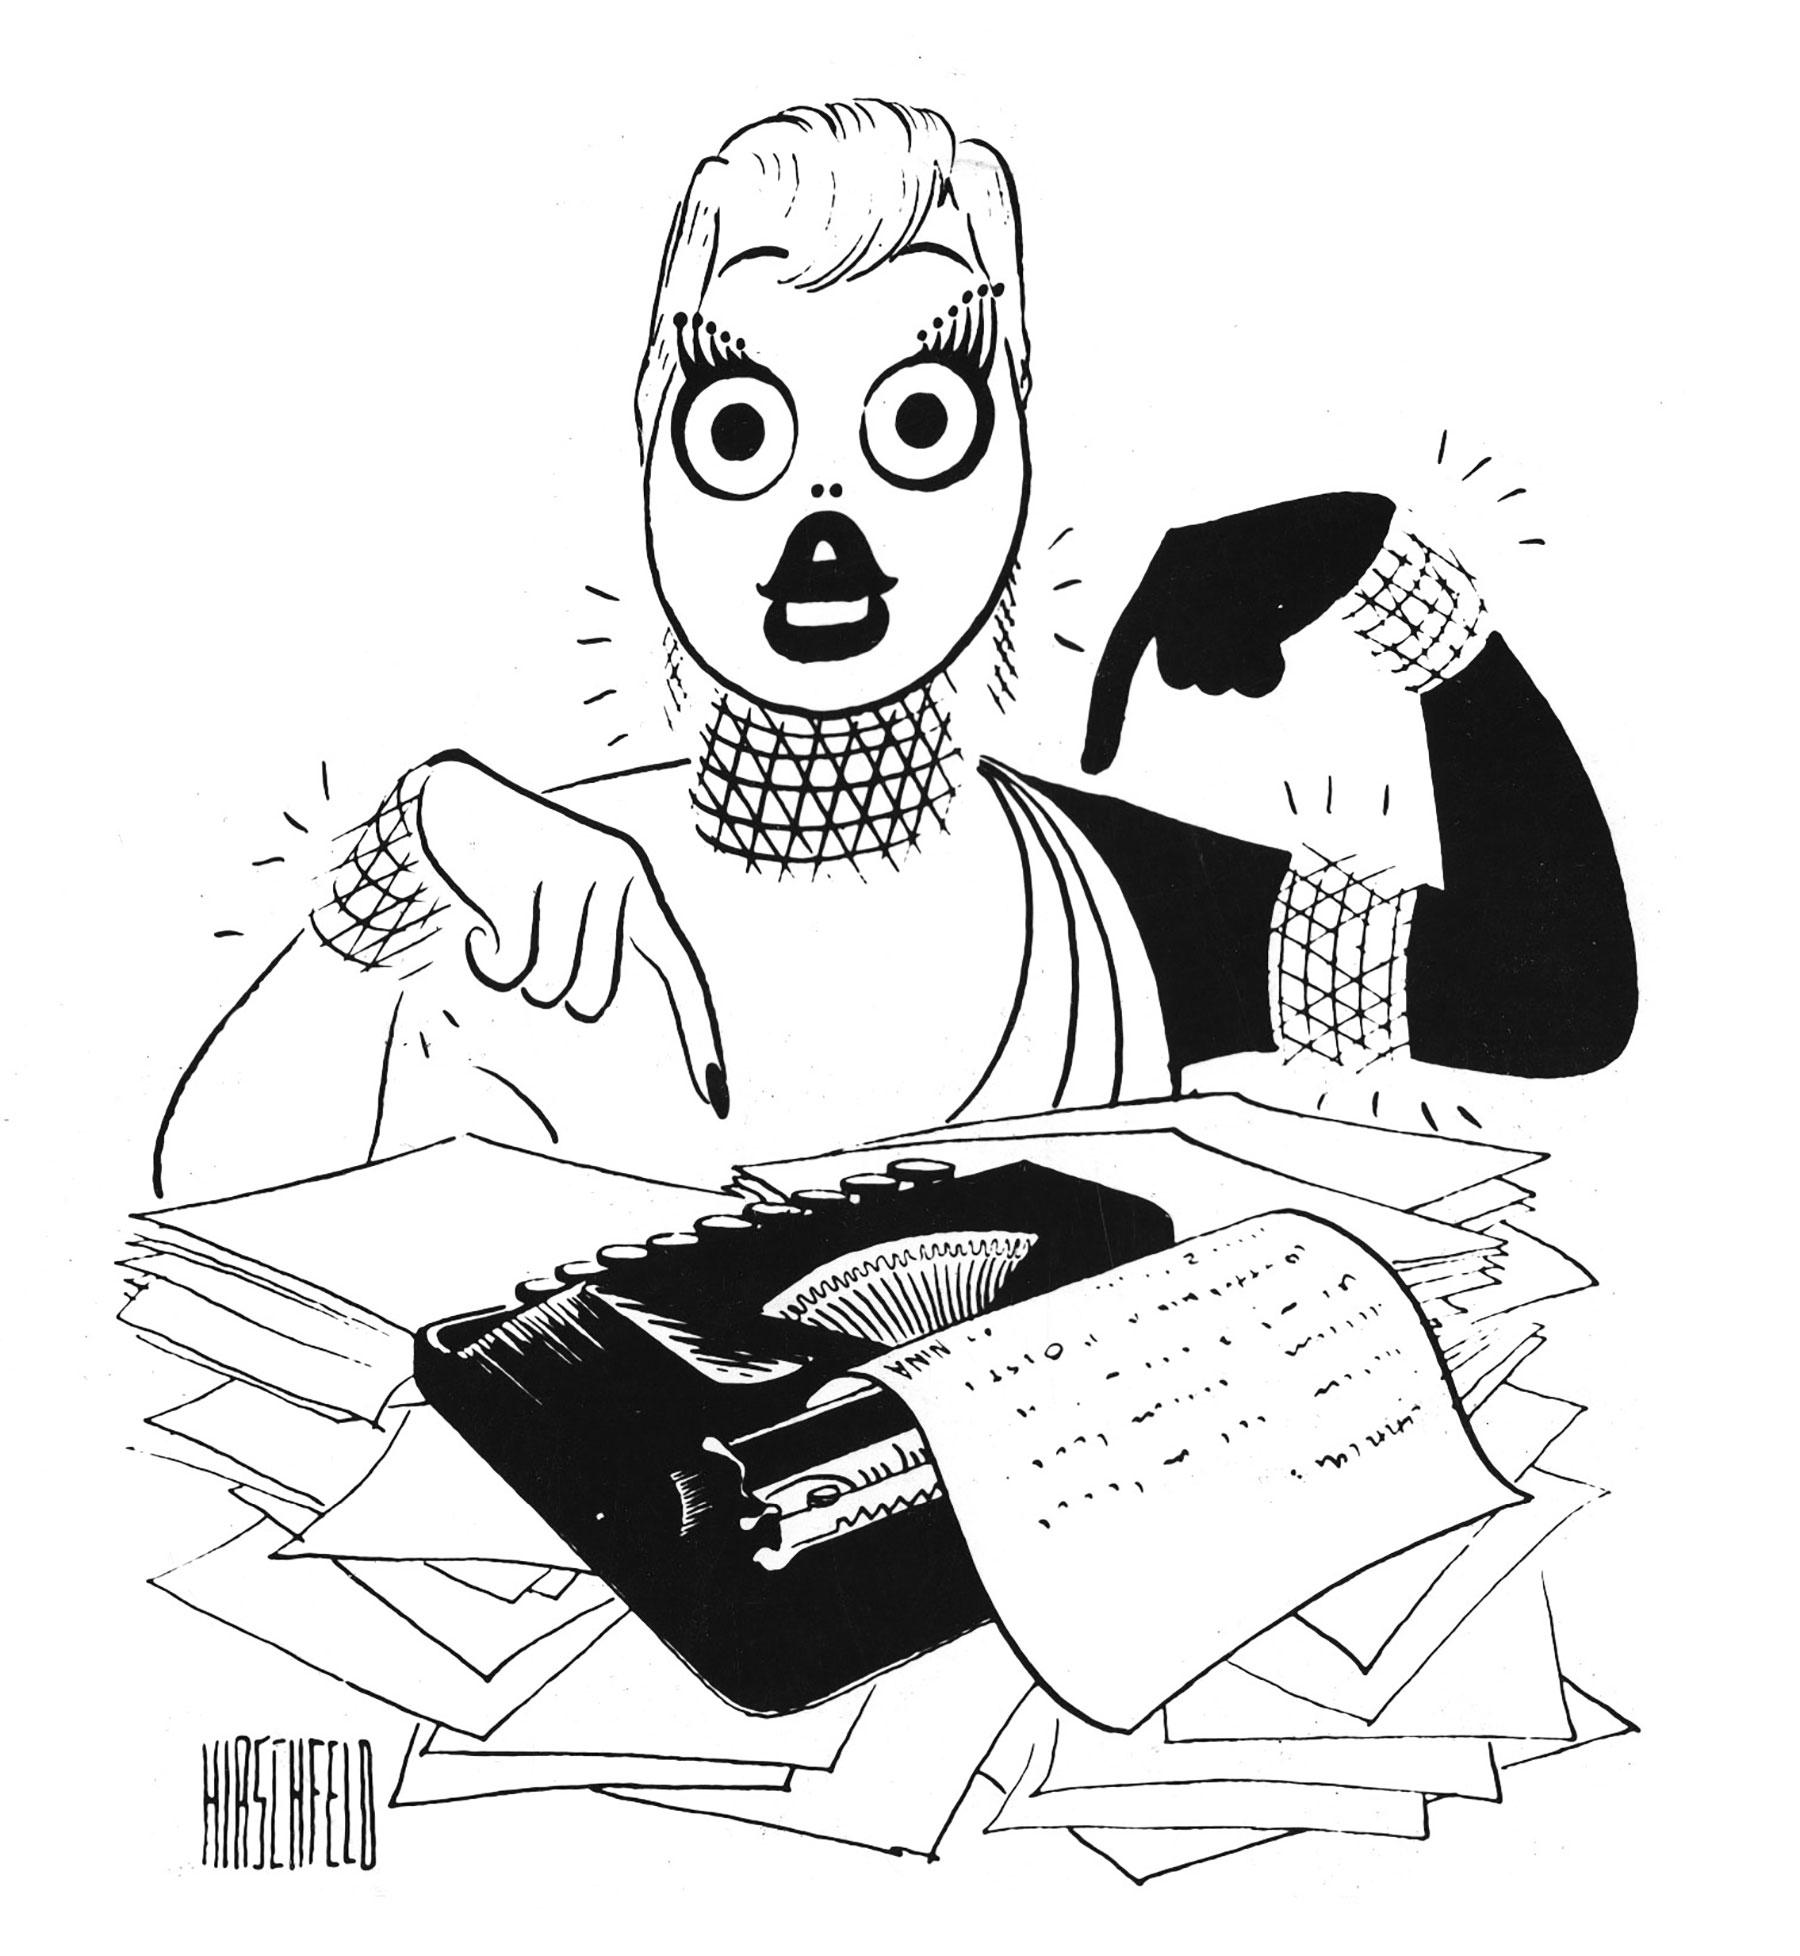 1870.jpg – Carol Channing in Gentlemen Prefer Blondes, 1950